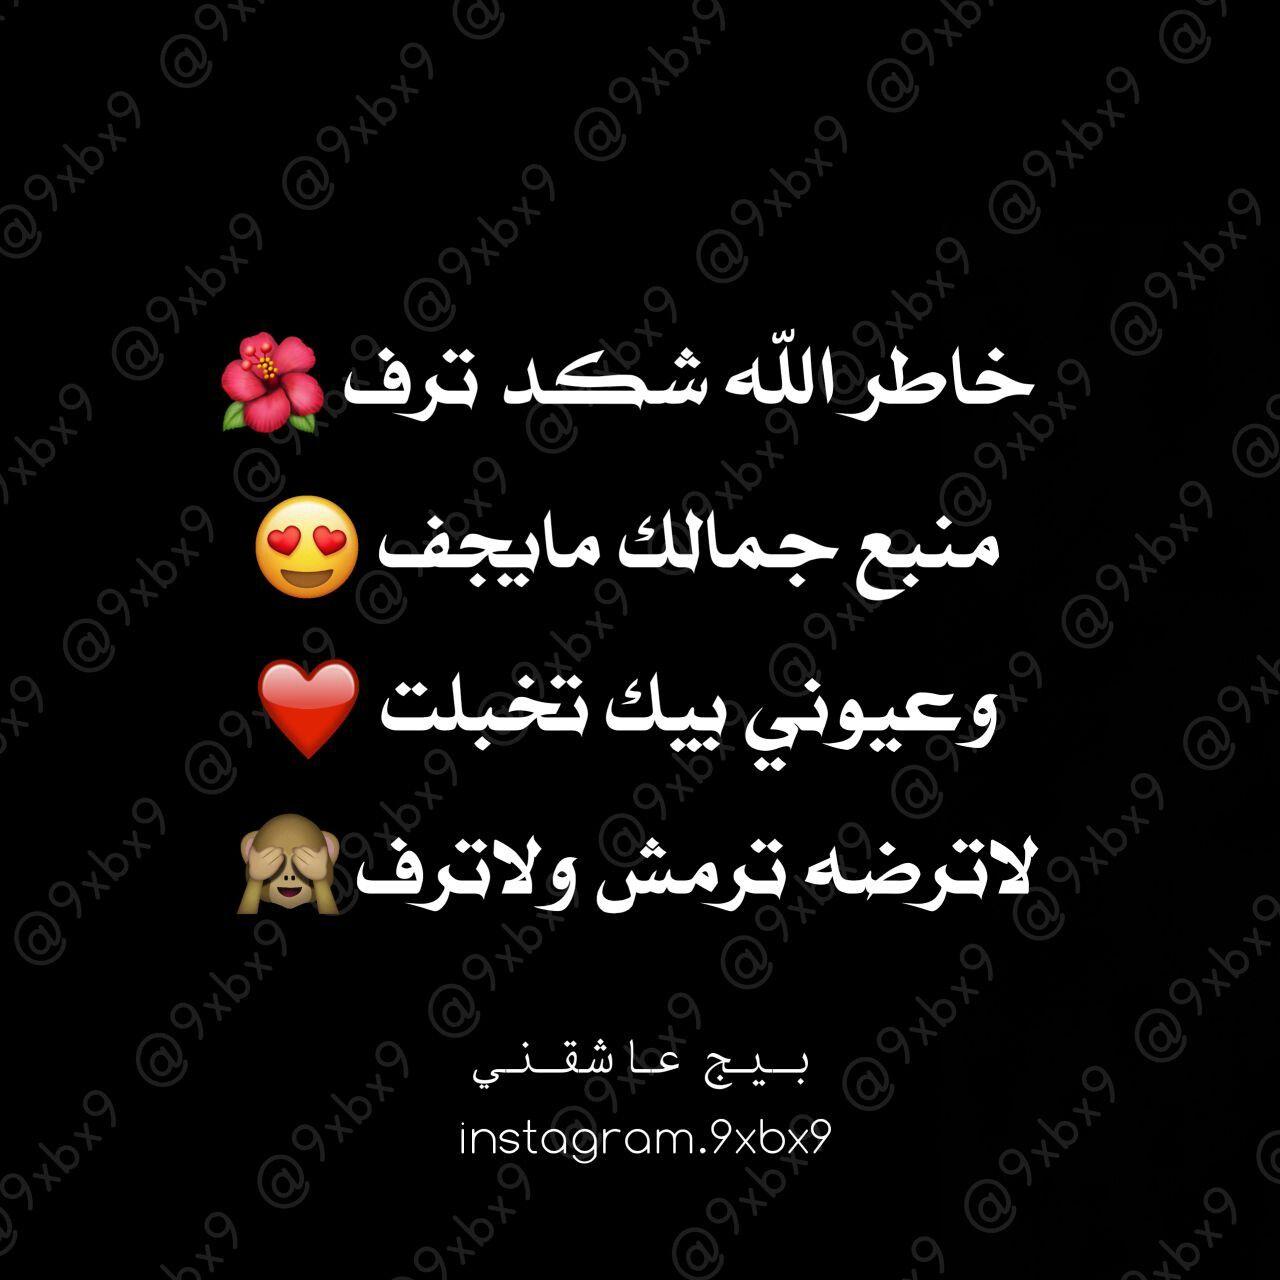 غزل عراقي جمال حب جمالك Movie Quotes Funny Arabic Love Quotes Words Quotes